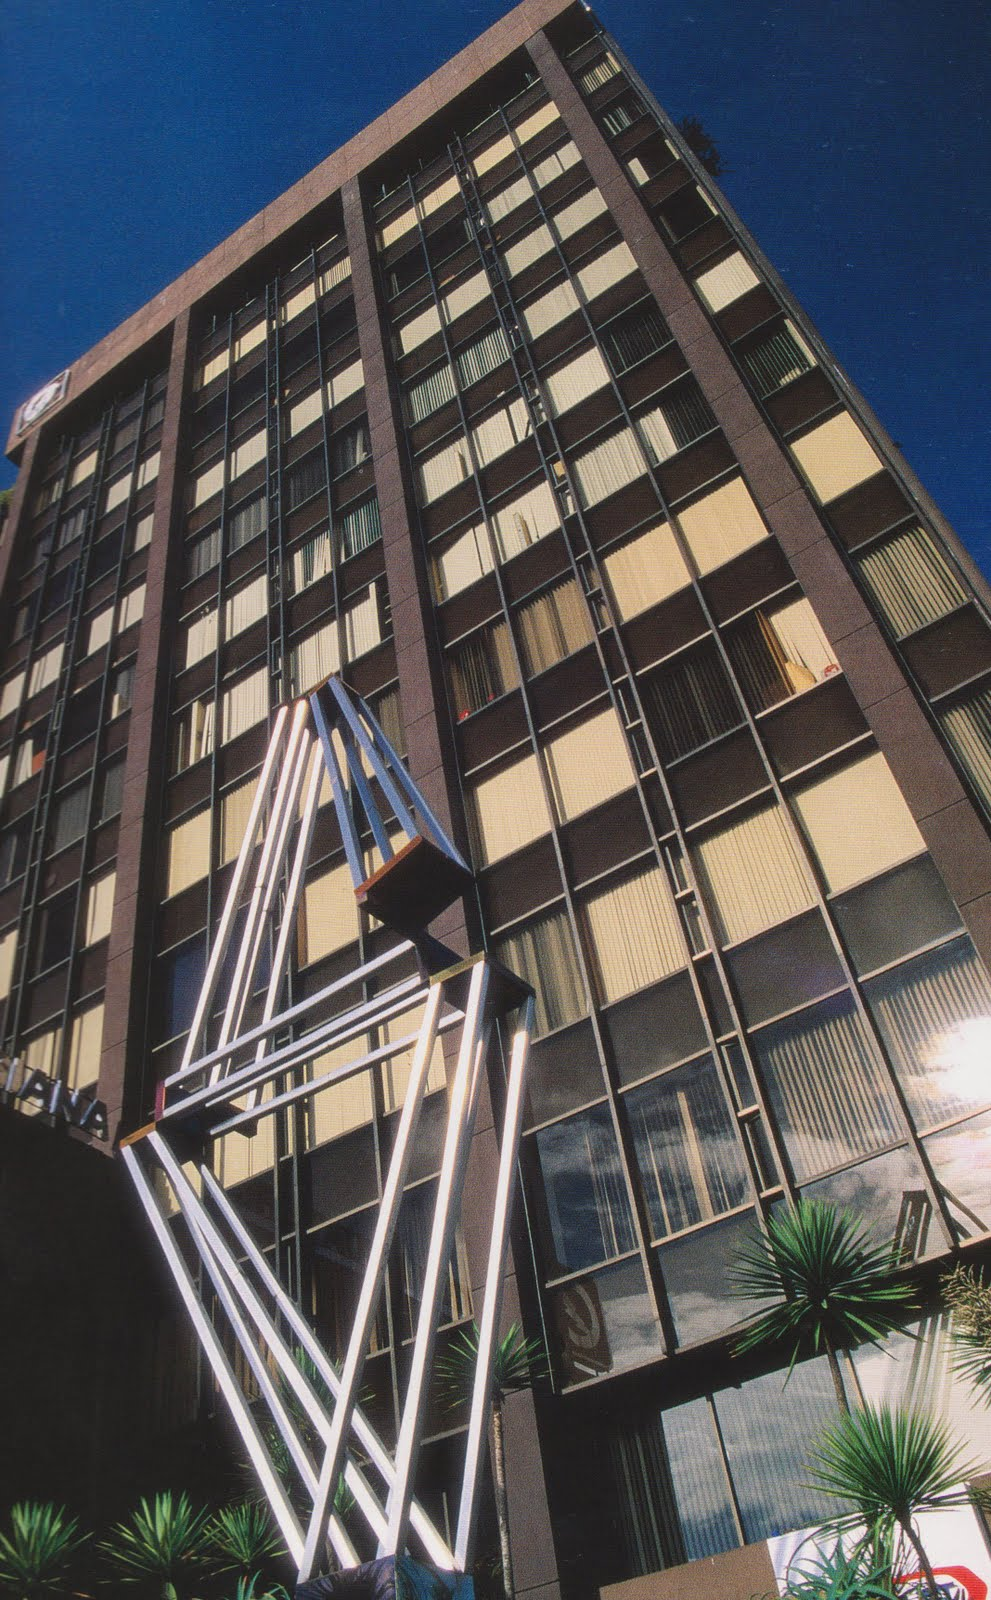 Arquitectura moderna en ecuador diego ponce for Arquitectos de la arquitectura moderna